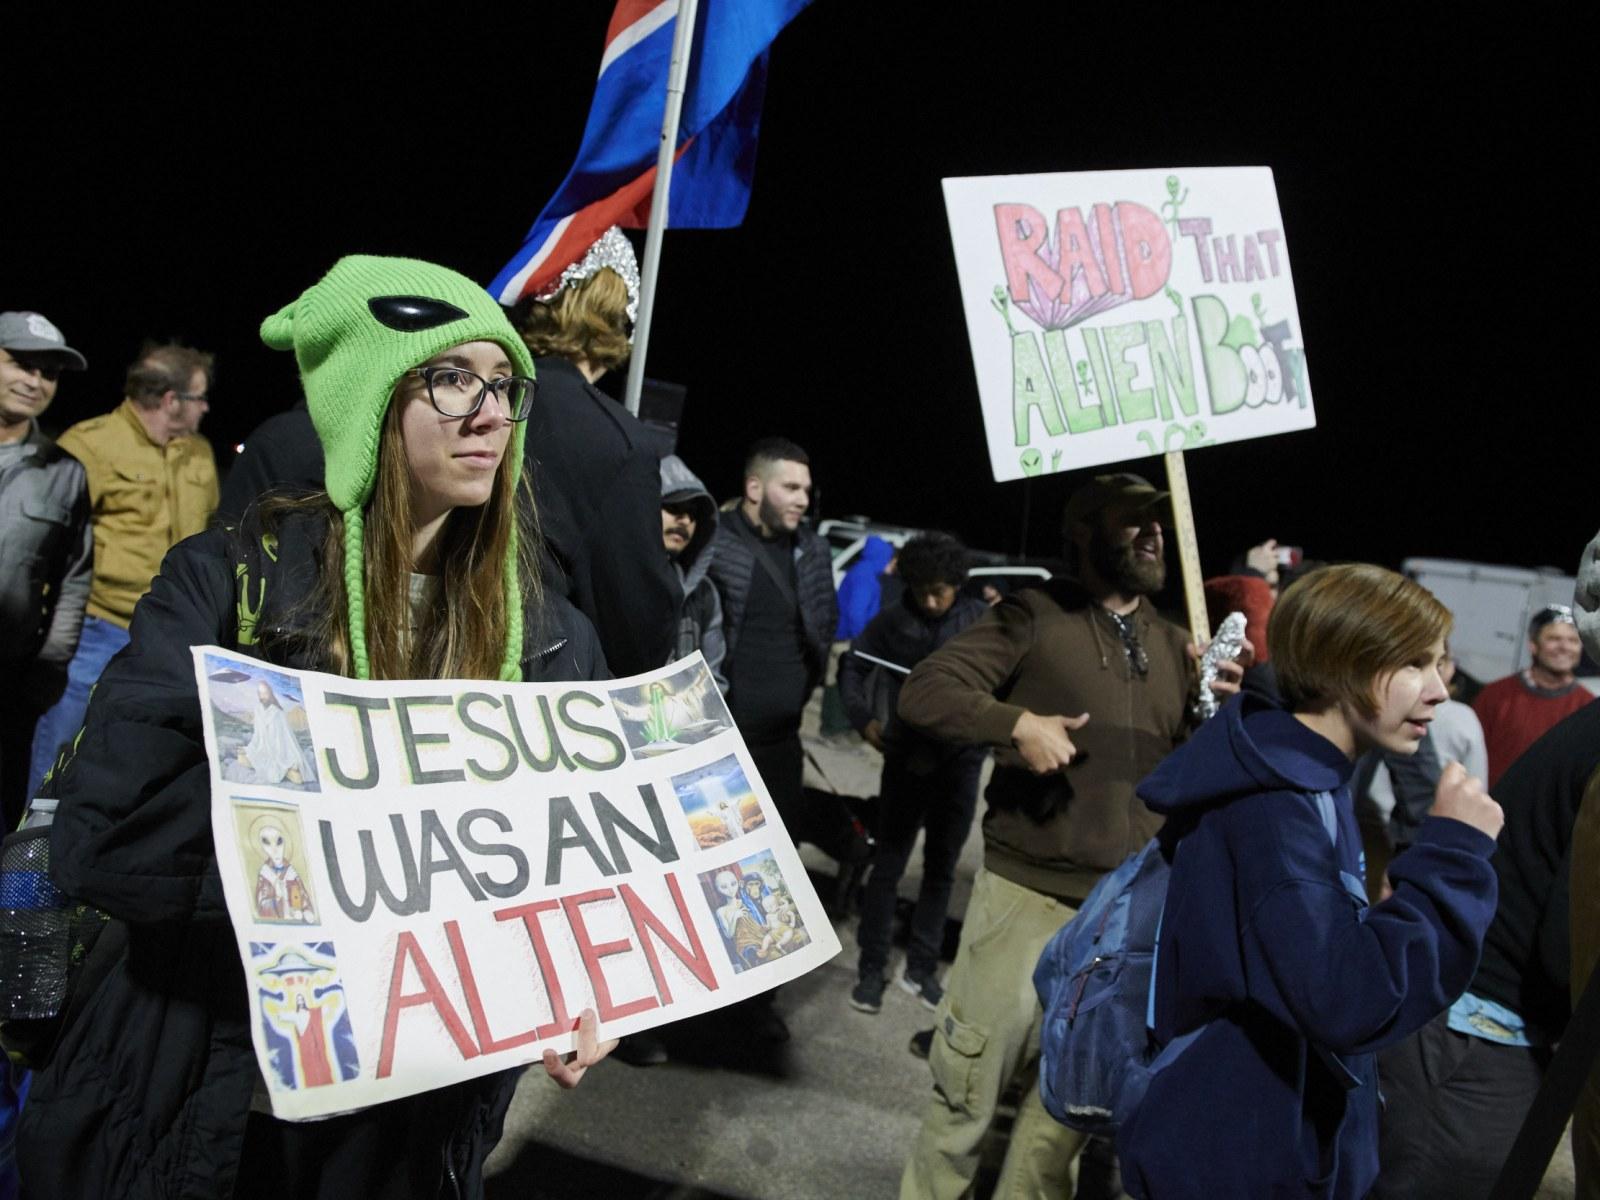 Area 51 Raid Memes Storm The Internet As Alien Enthusiasts Descend On Rural Nevada